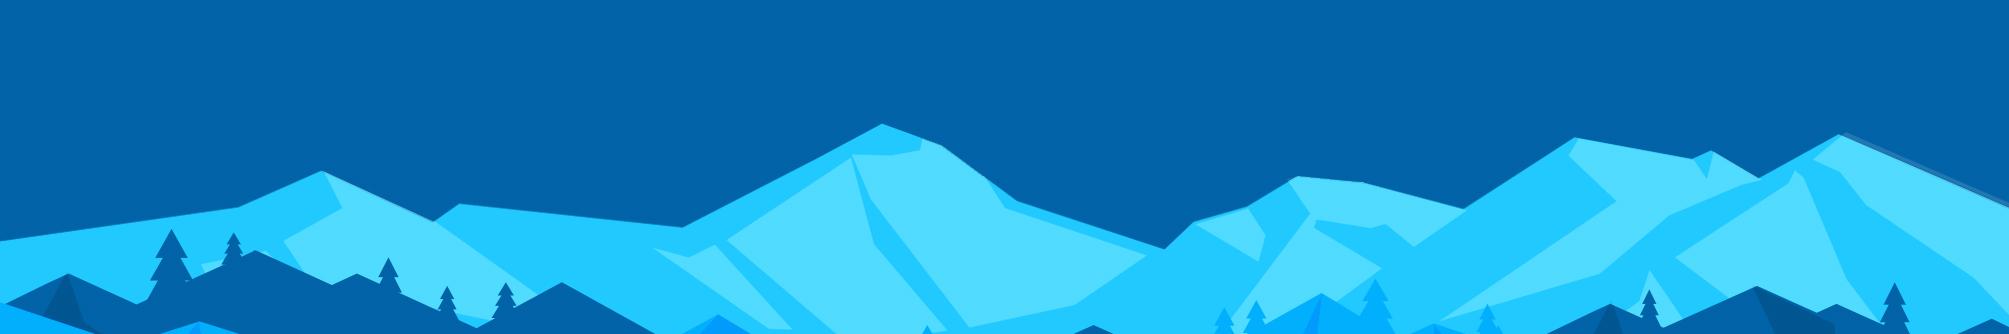 Announcing_Your_Salesforce_Partnership